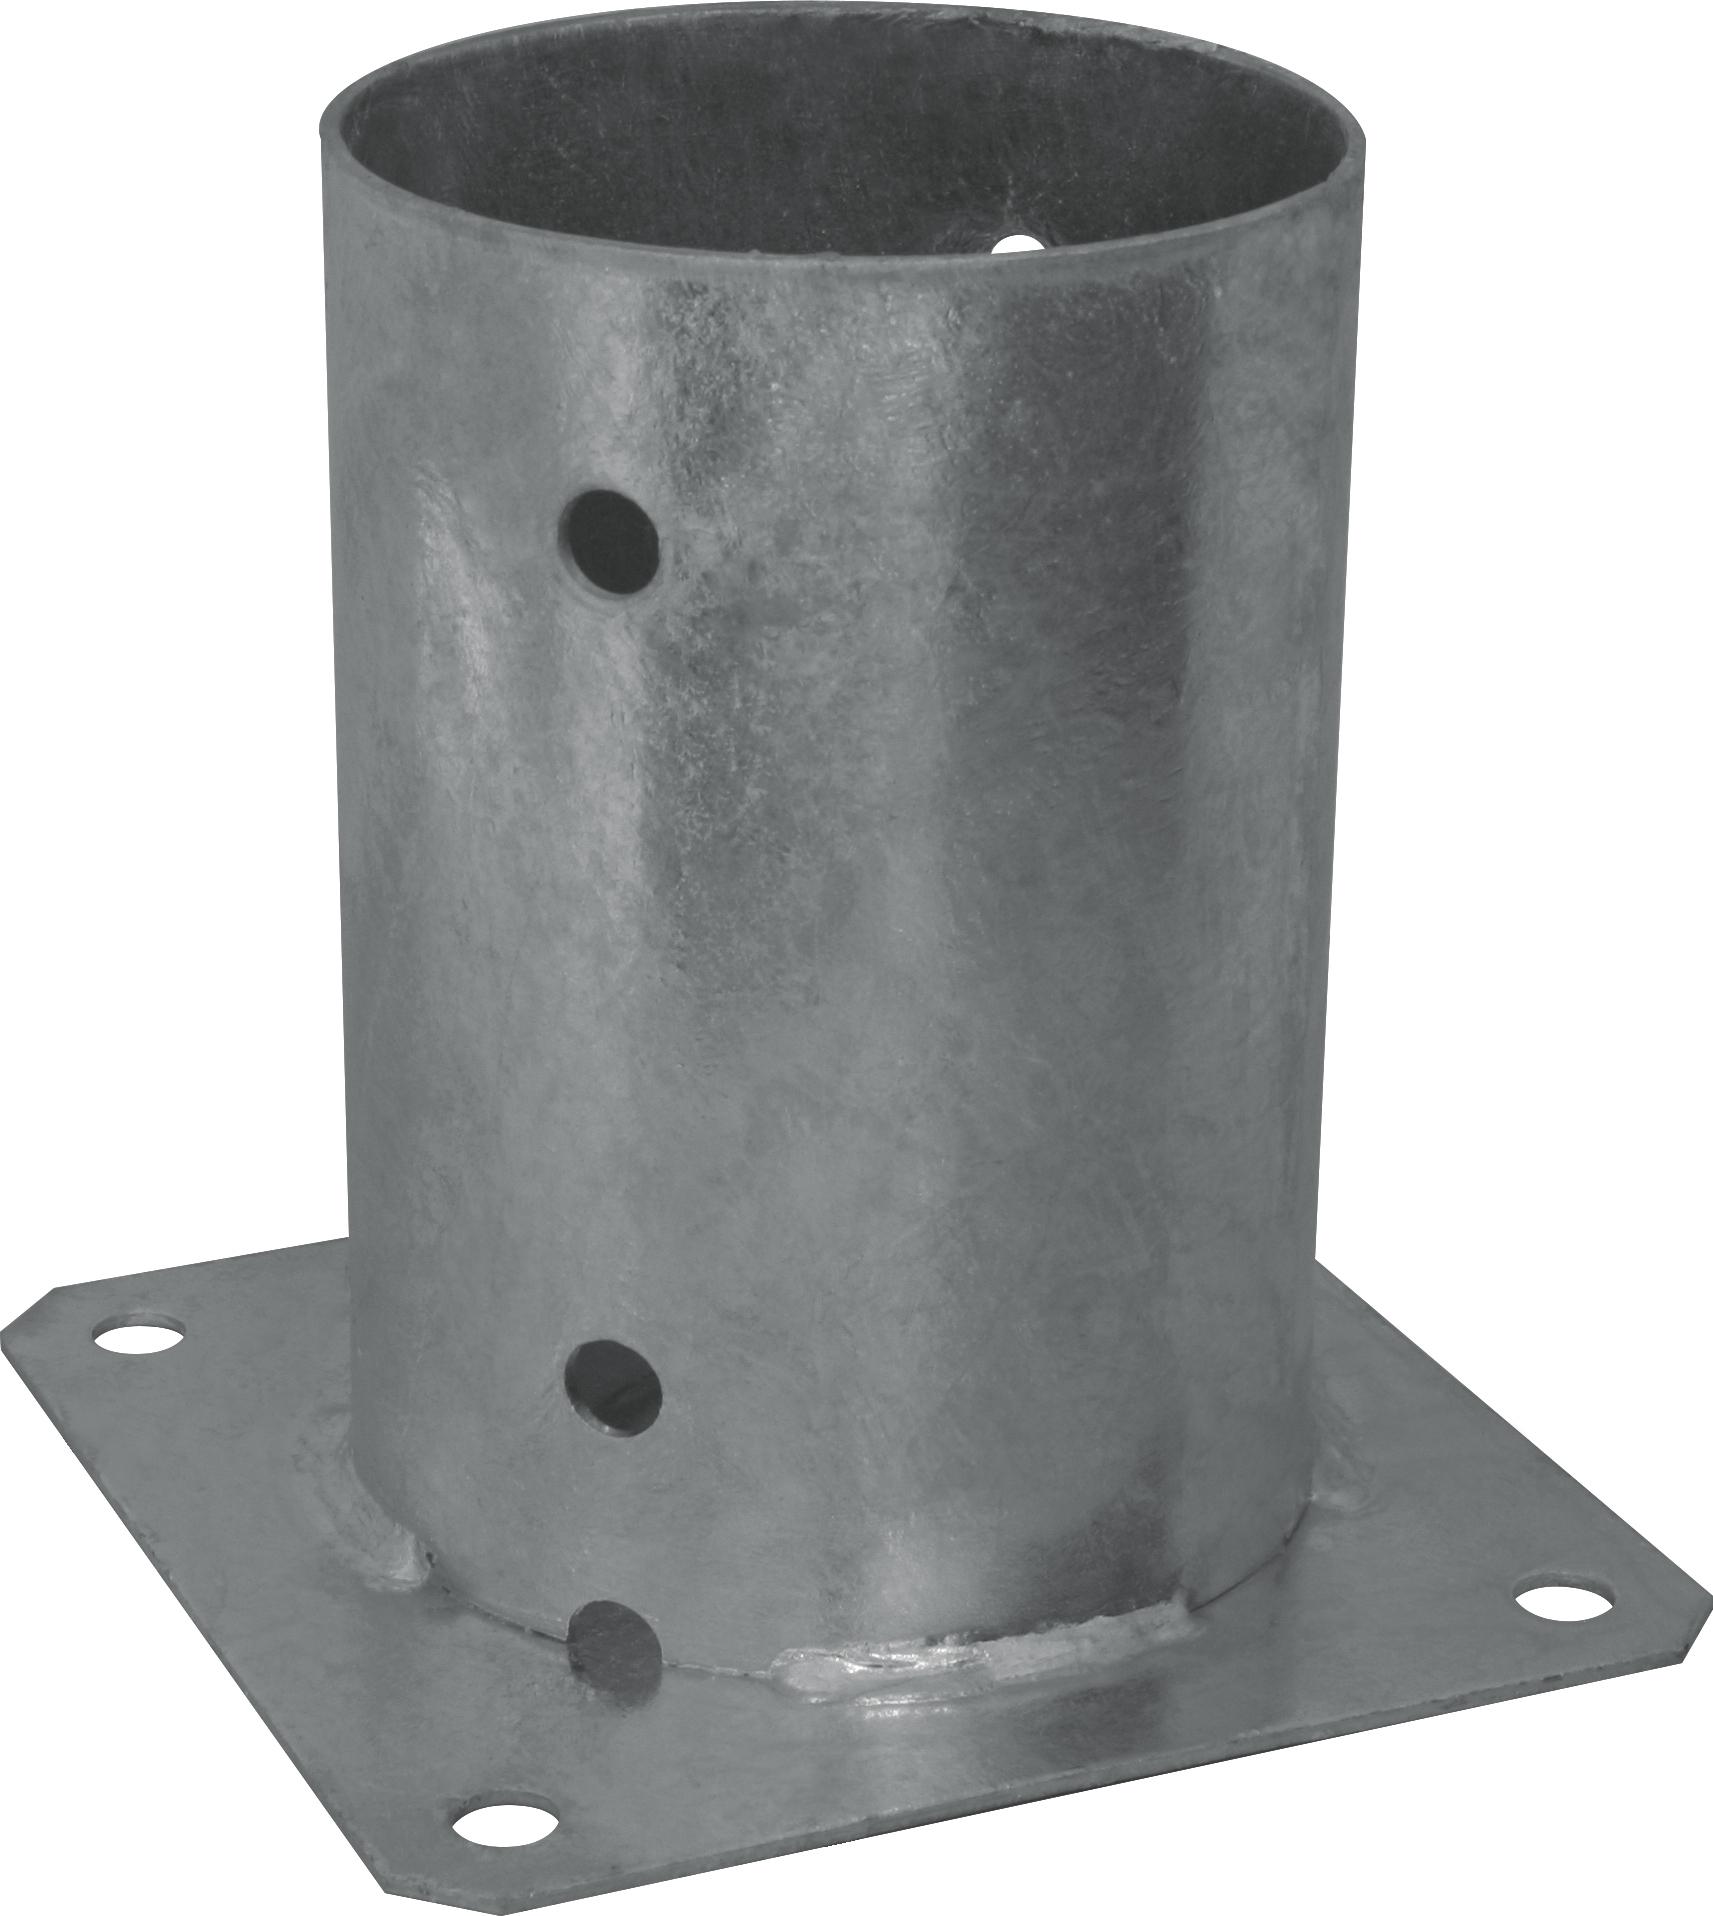 STAFFA BASE TONDA CM  100 X 150 H 150